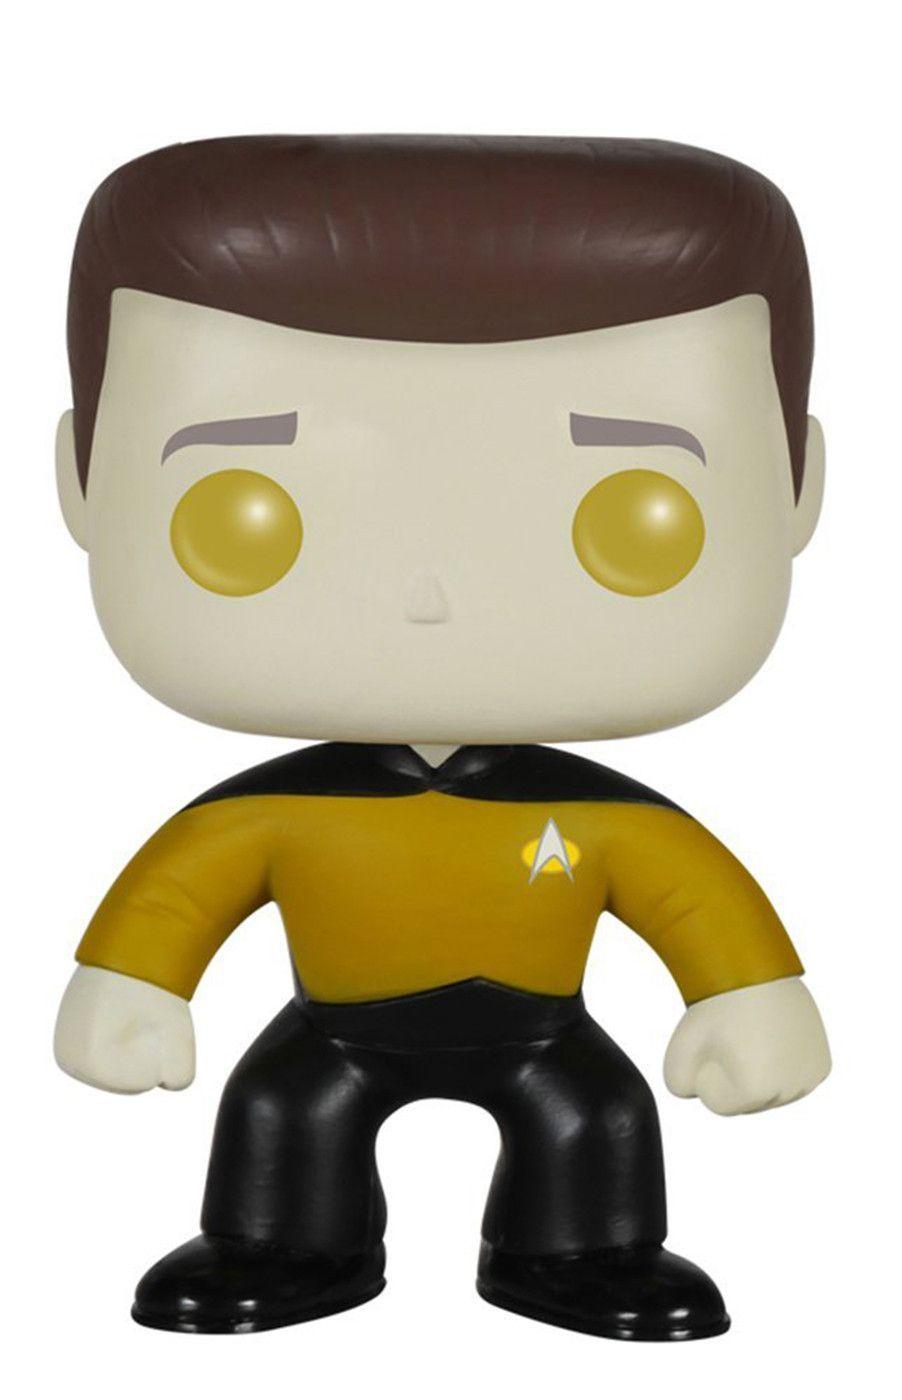 Star Trek The Next Generation Funko POP Vinyl Figure Data